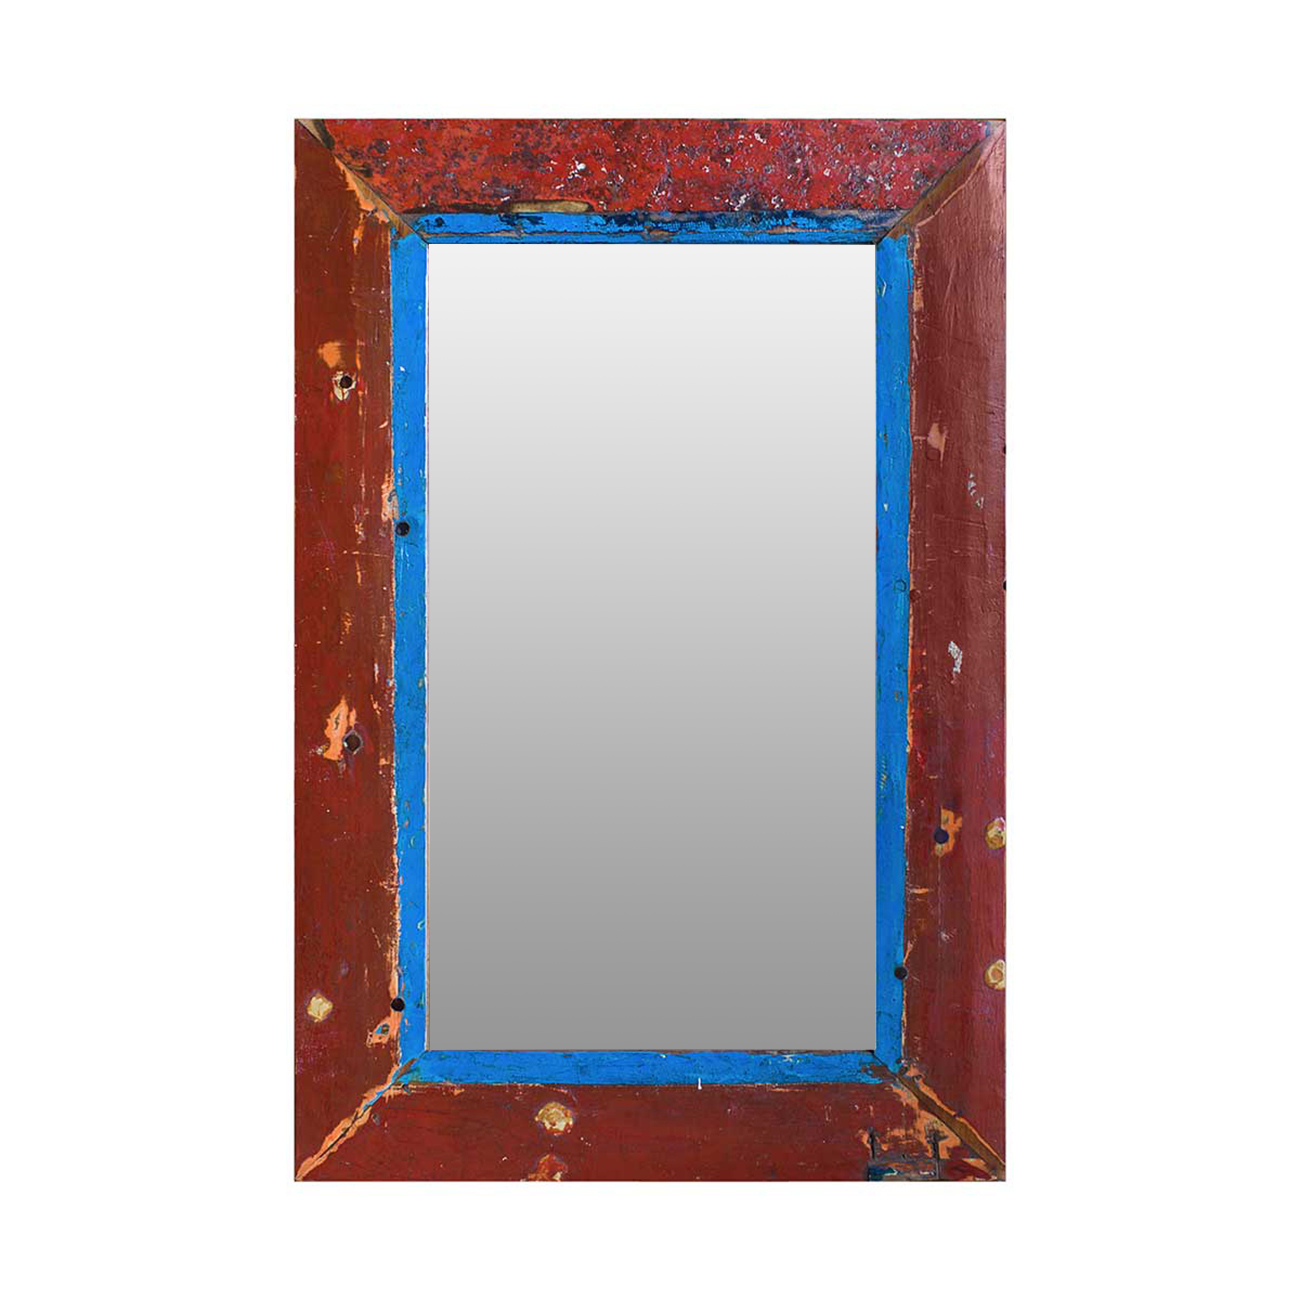 Зеркало Like Lodka 15578230 от Cosmorelax